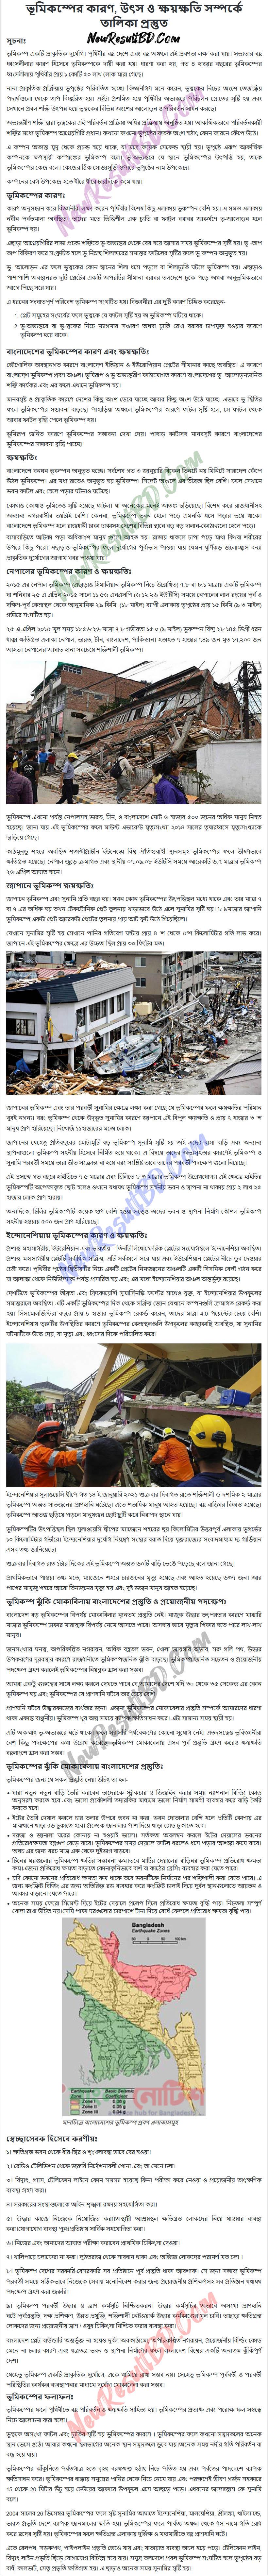 SSC Bangladesh & Global Studies 5th Week Assignment 2022 Answer